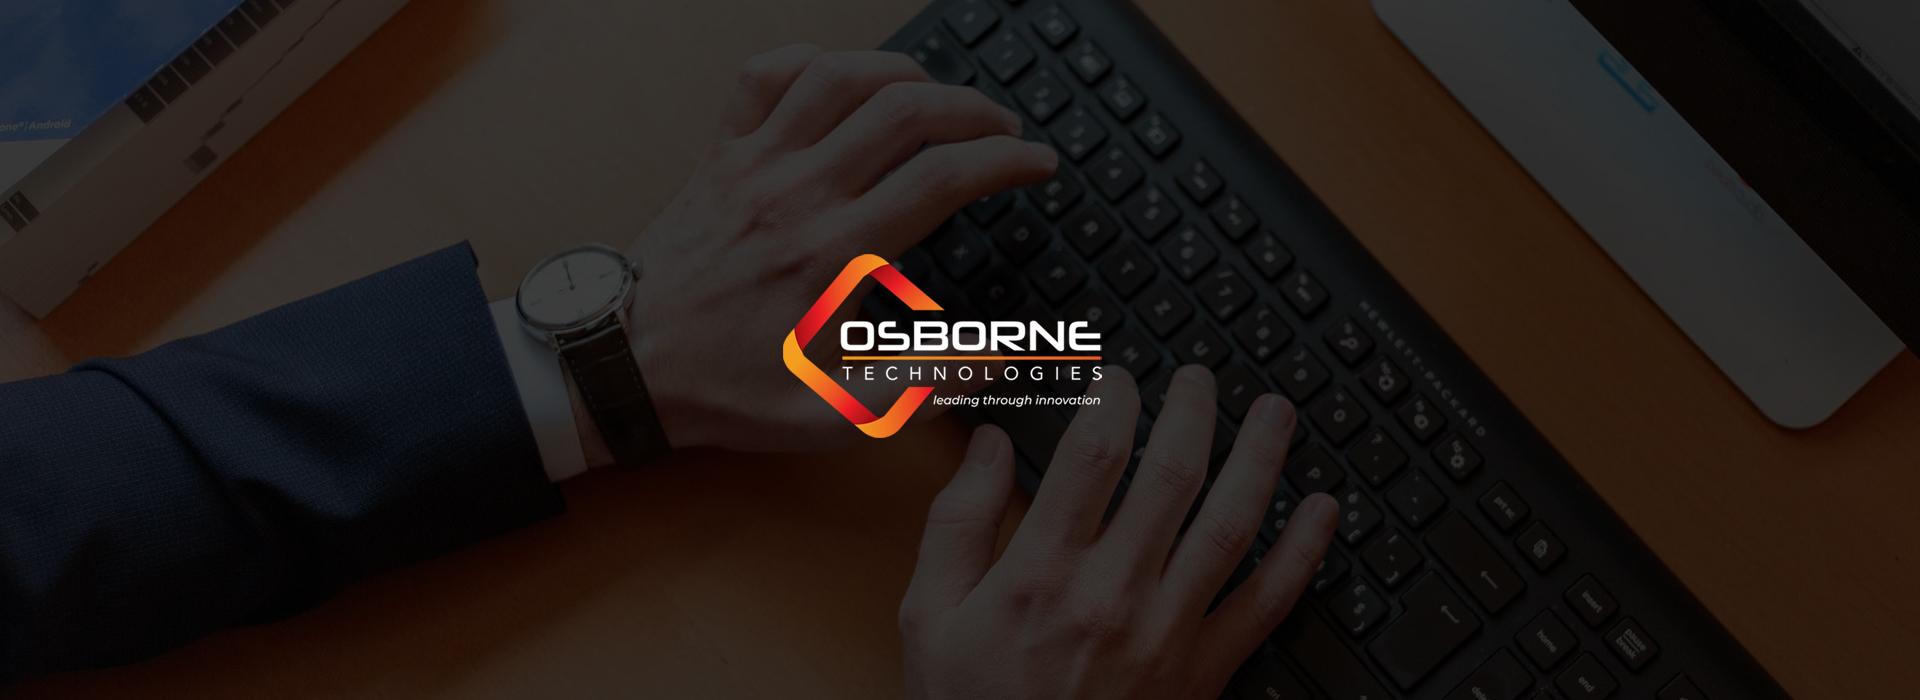 osbourne technologies